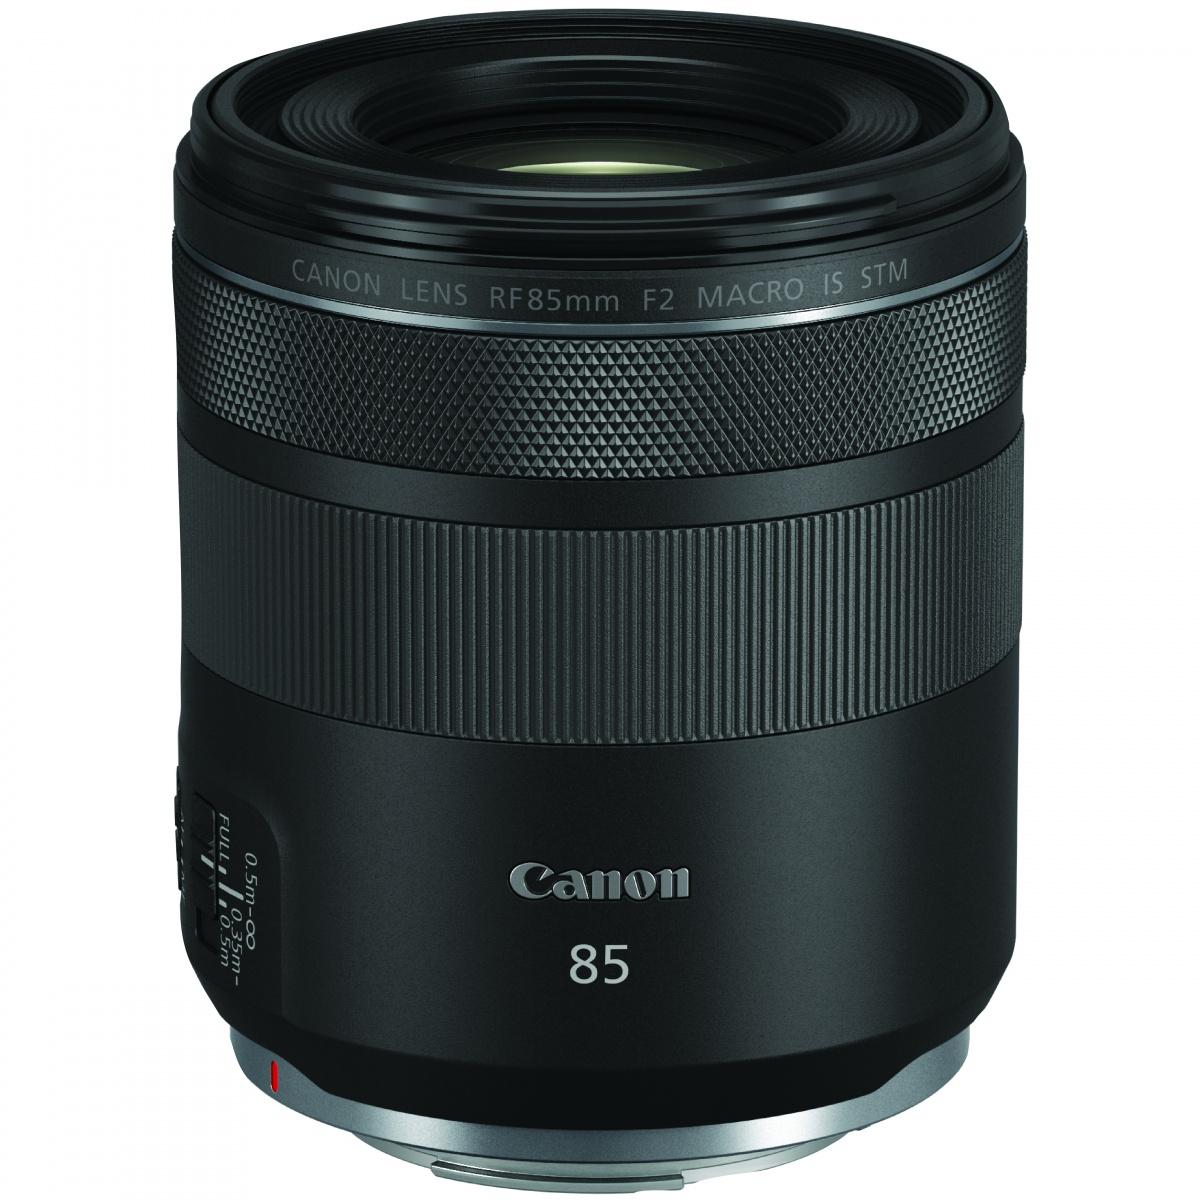 Canon RF 85 mm 1:2,0 IS STM Macro